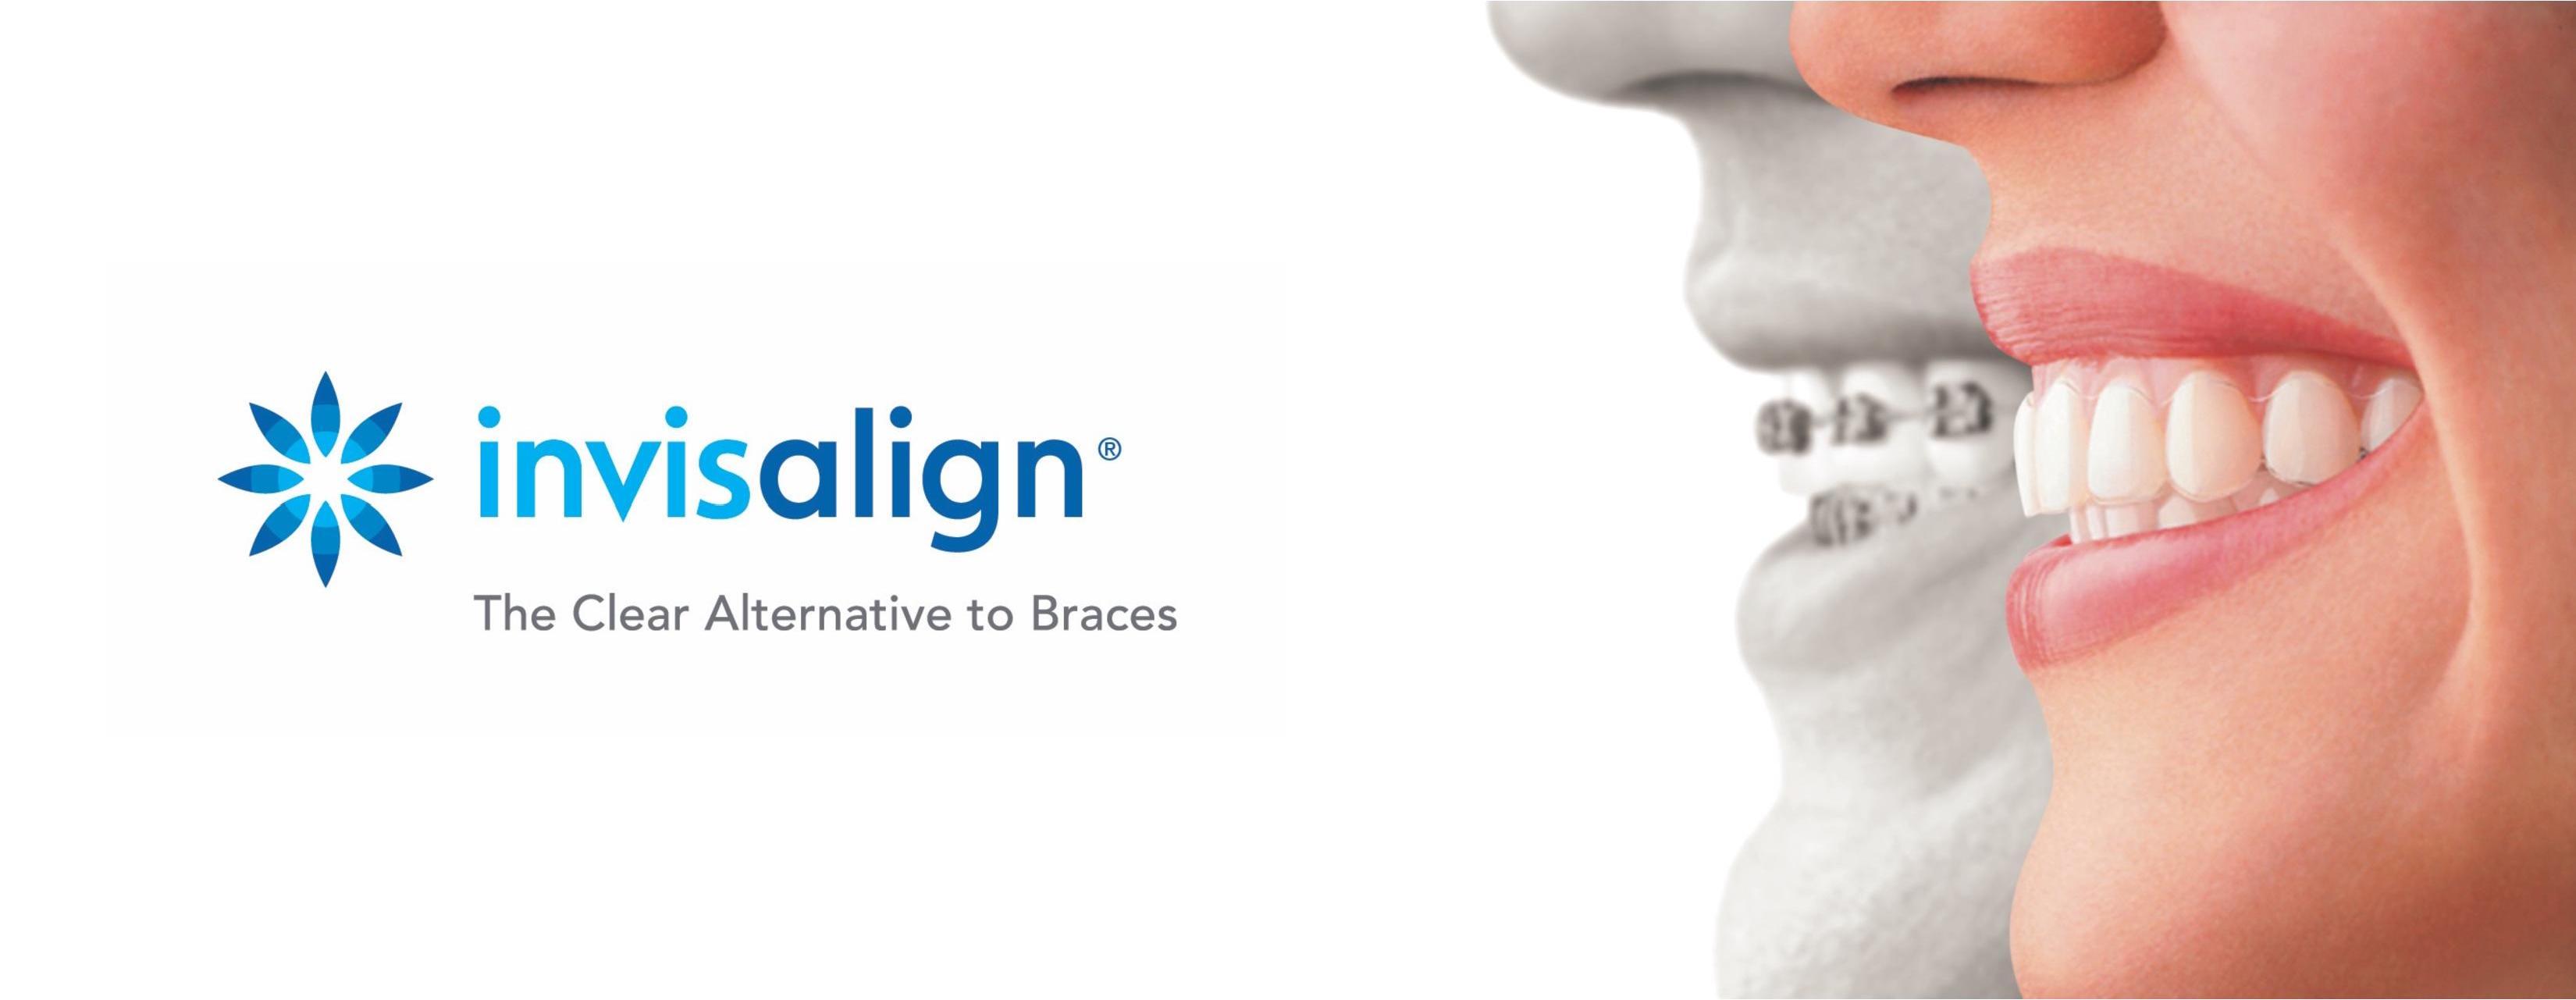 Invisalign Smile Dental Clinic